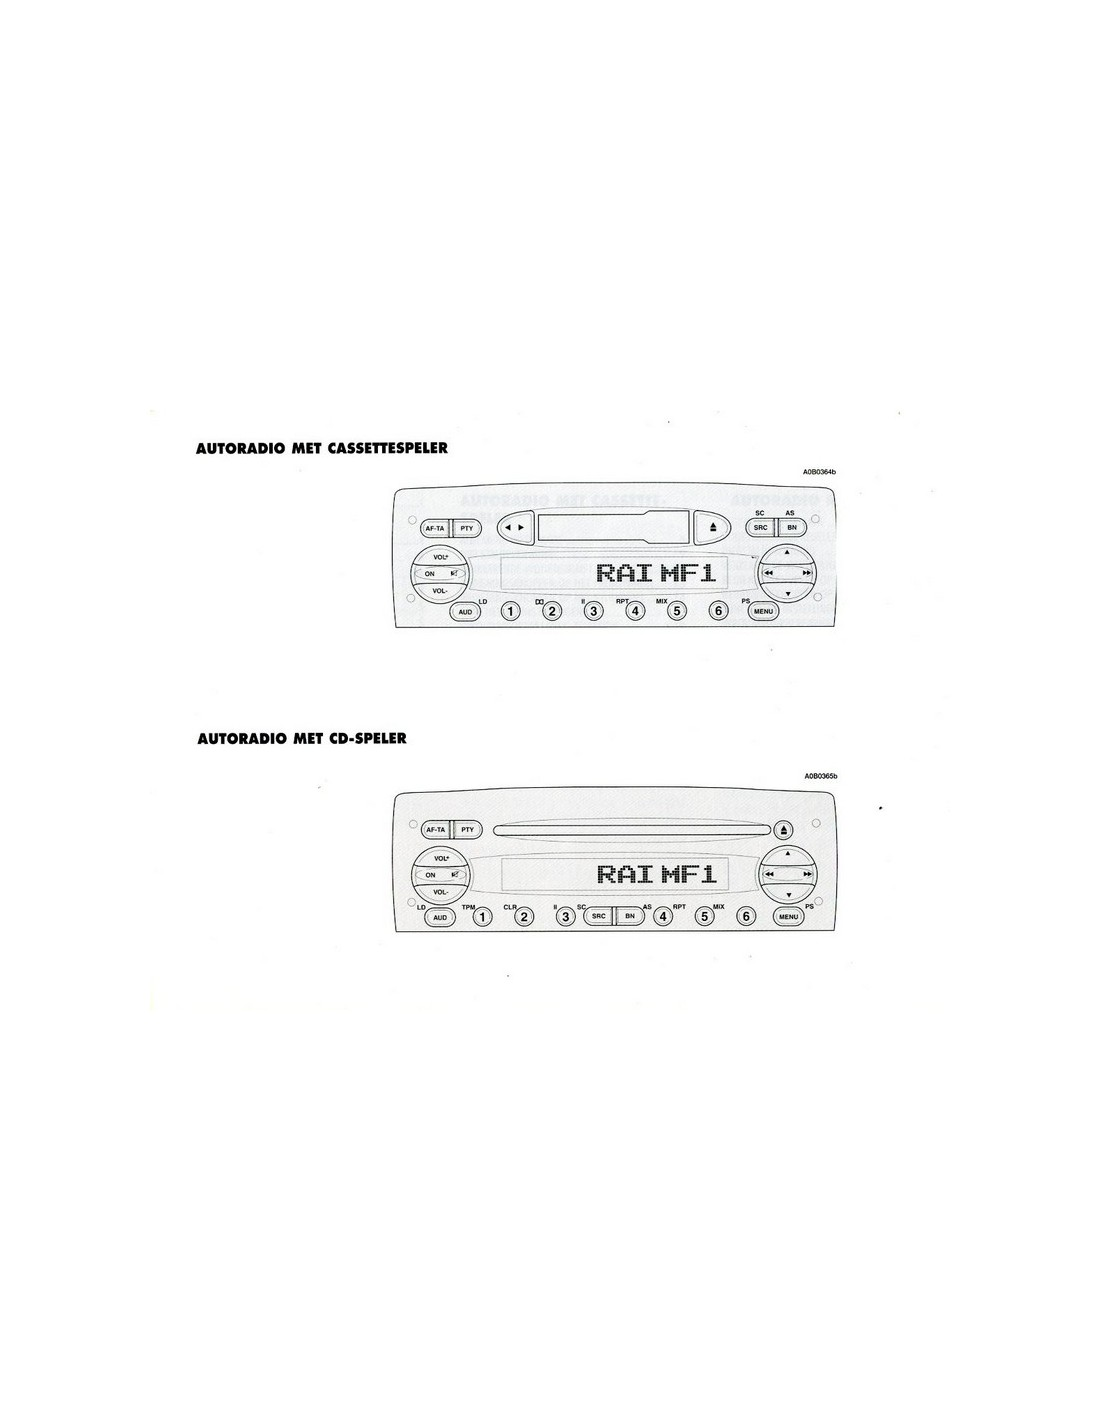 2002 alfa romeo 156 audio owners manual dutch